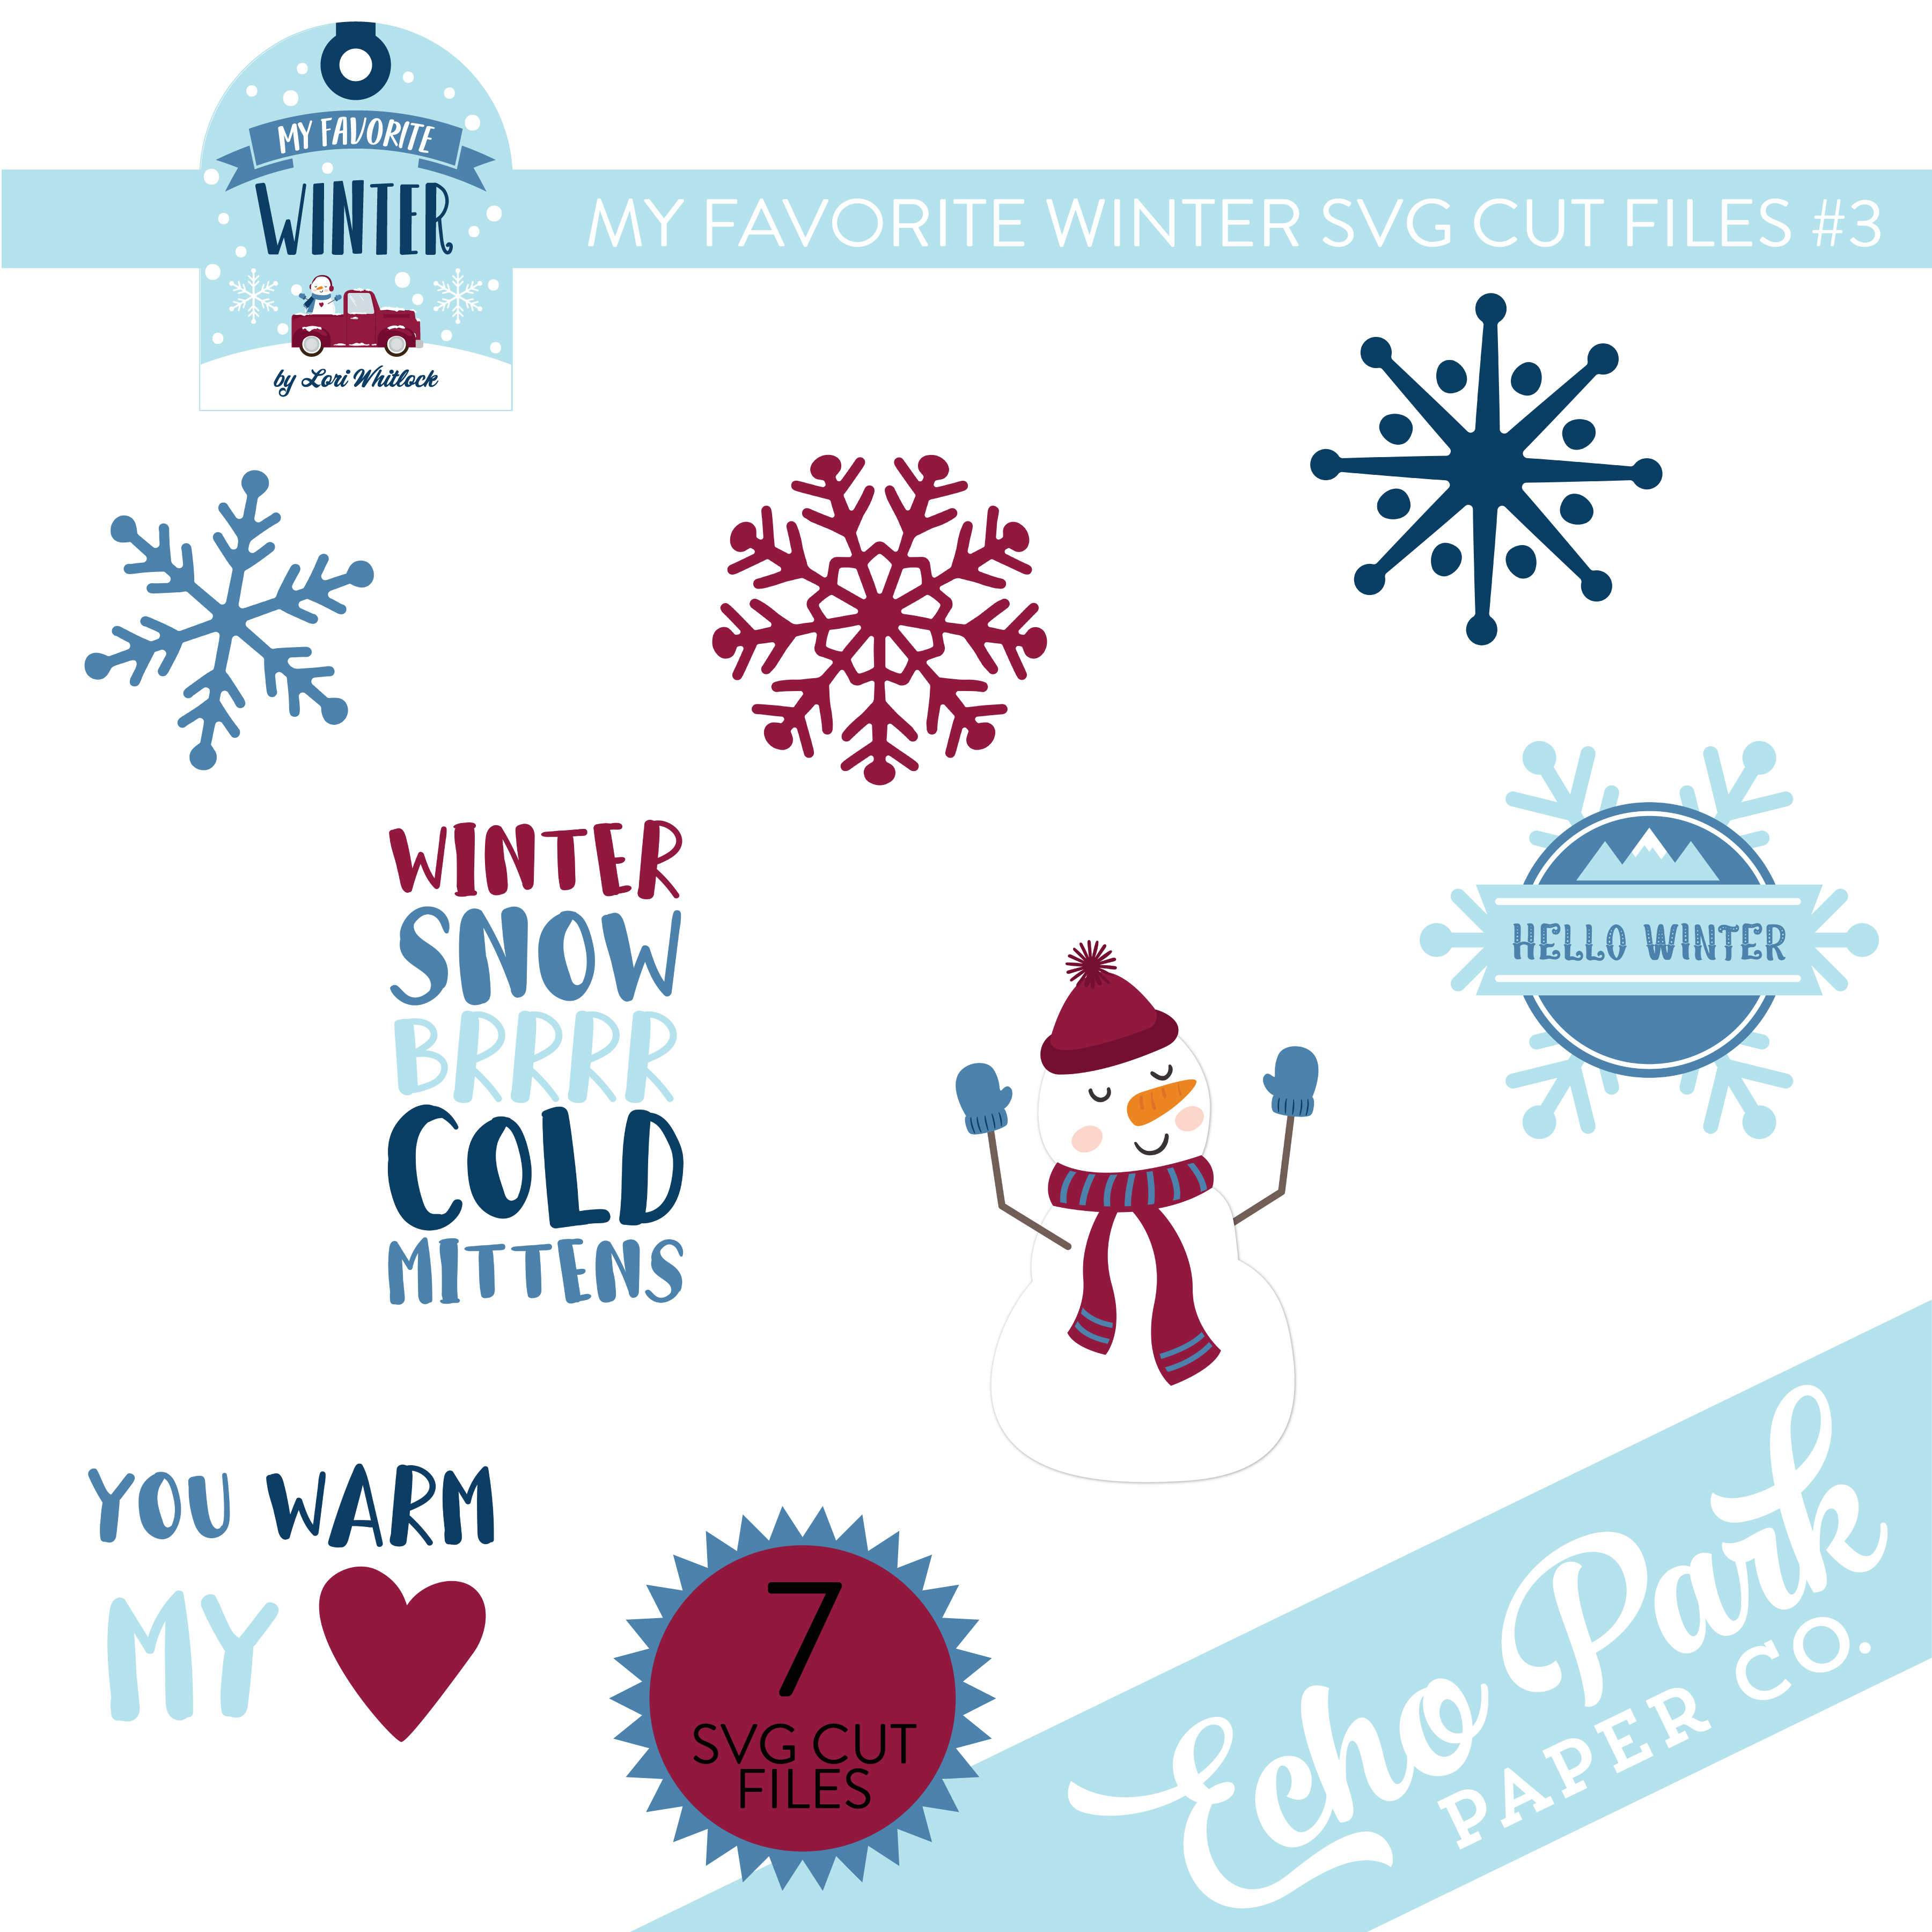 My Favorite Winter SVG Cut Files #3